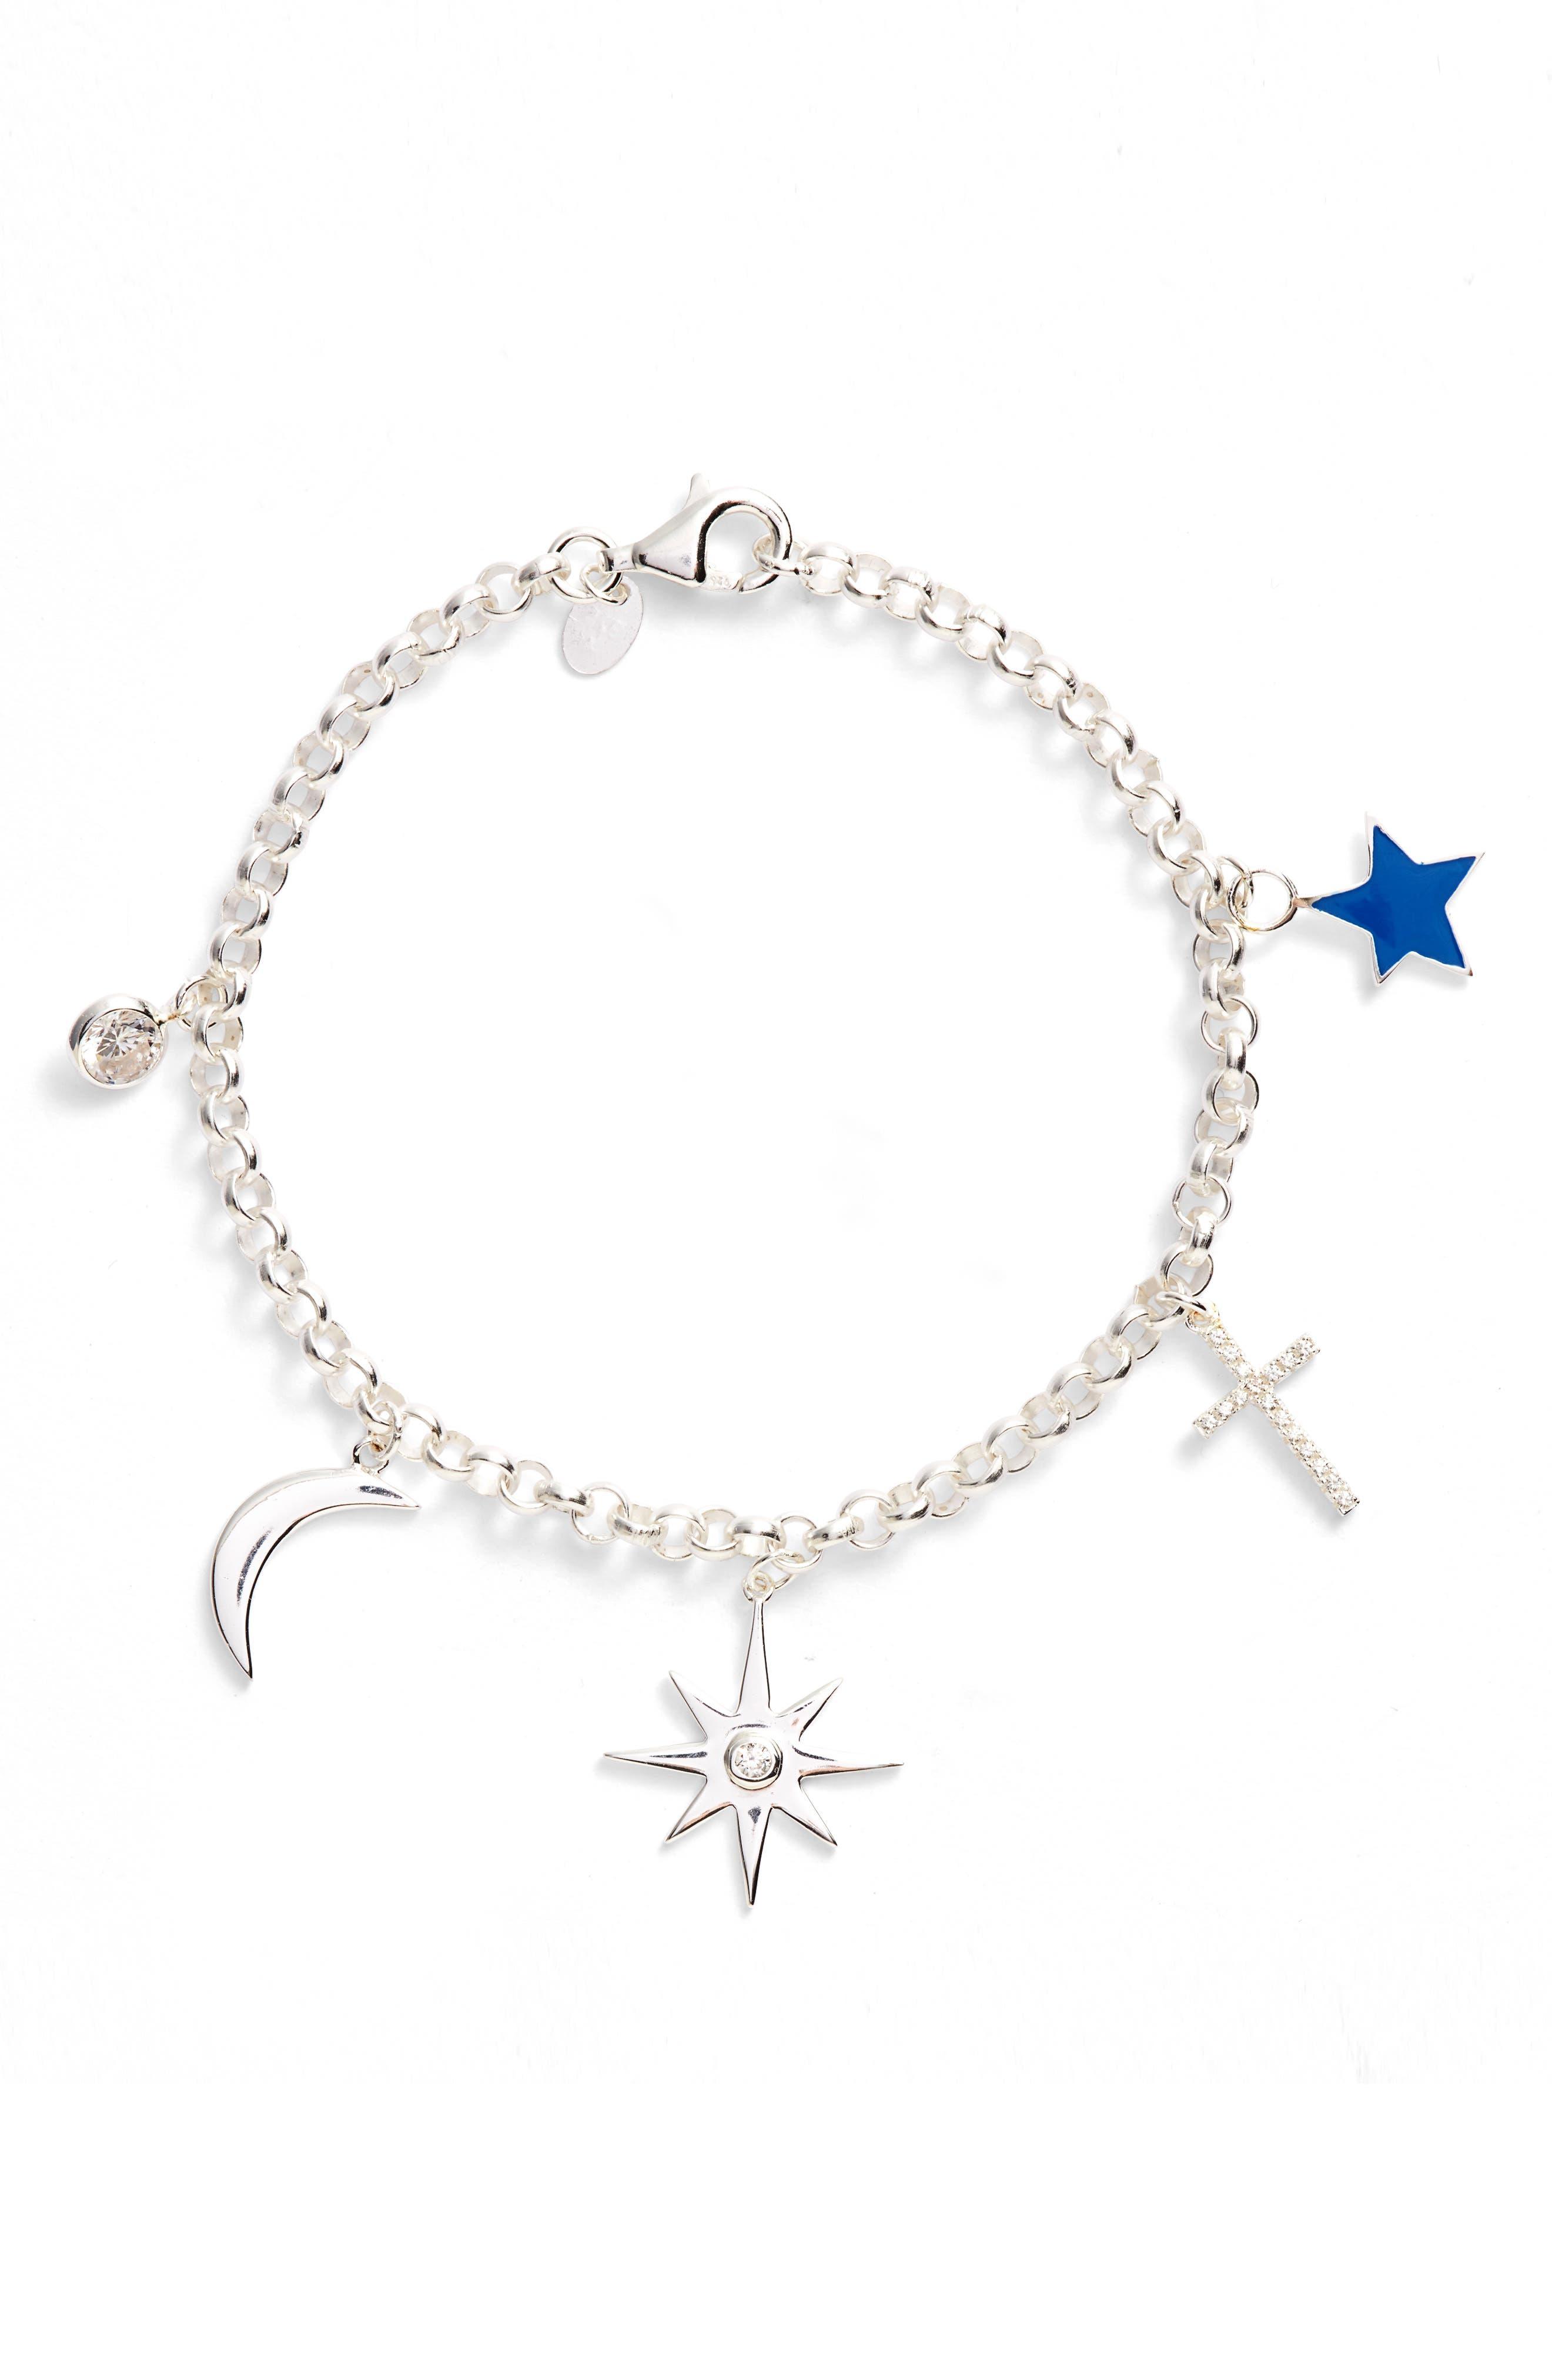 North Star Charm Bracelet,                             Main thumbnail 1, color,